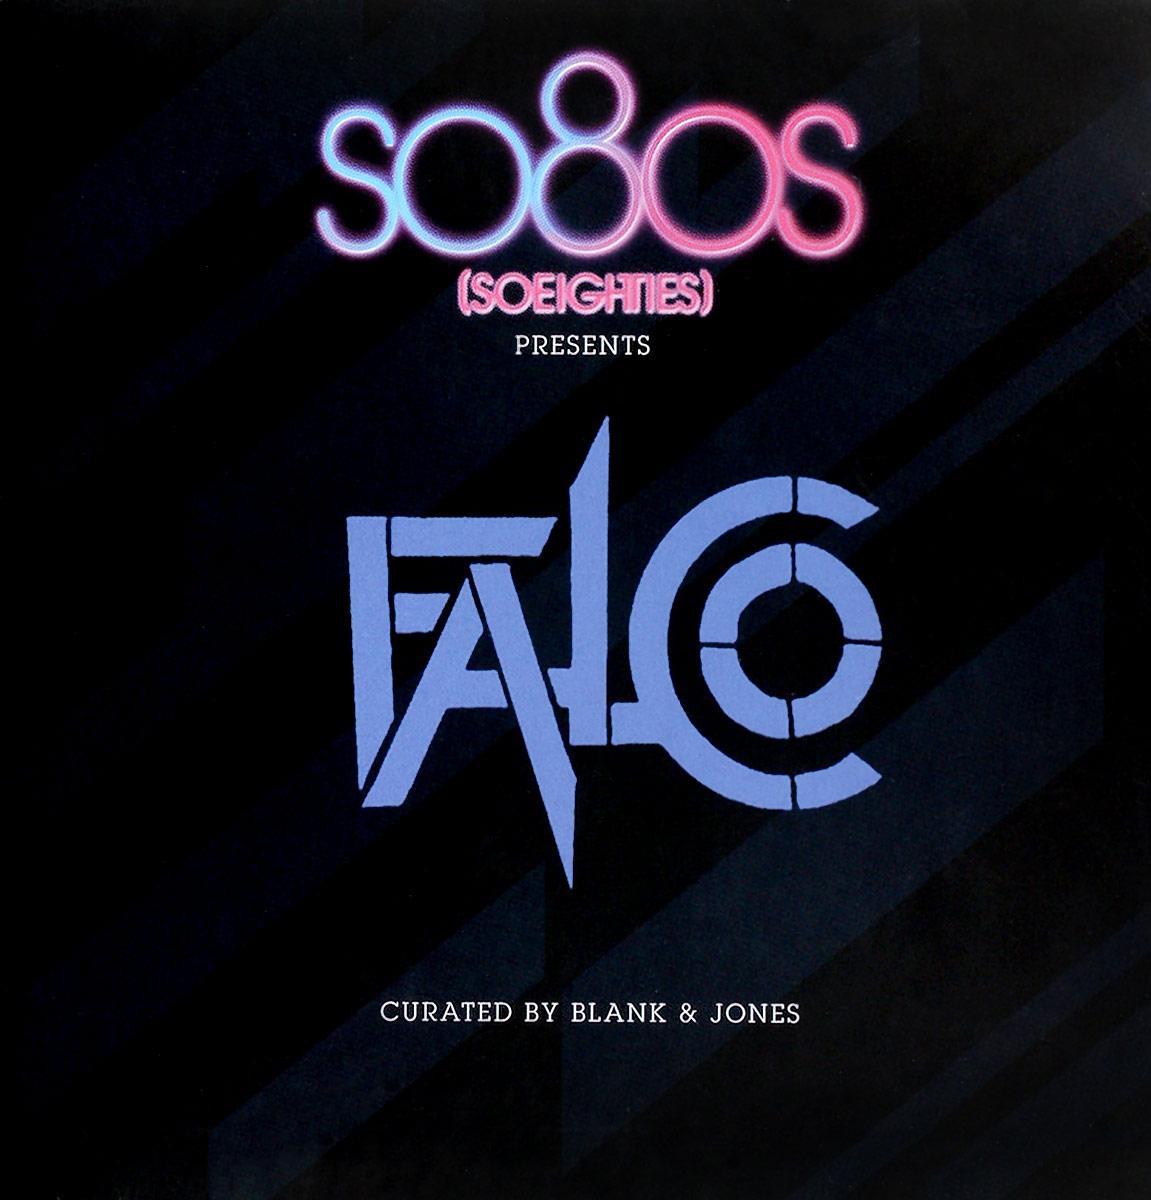 Blank & Jones  & . So 80' Presents Falco (2 CD)